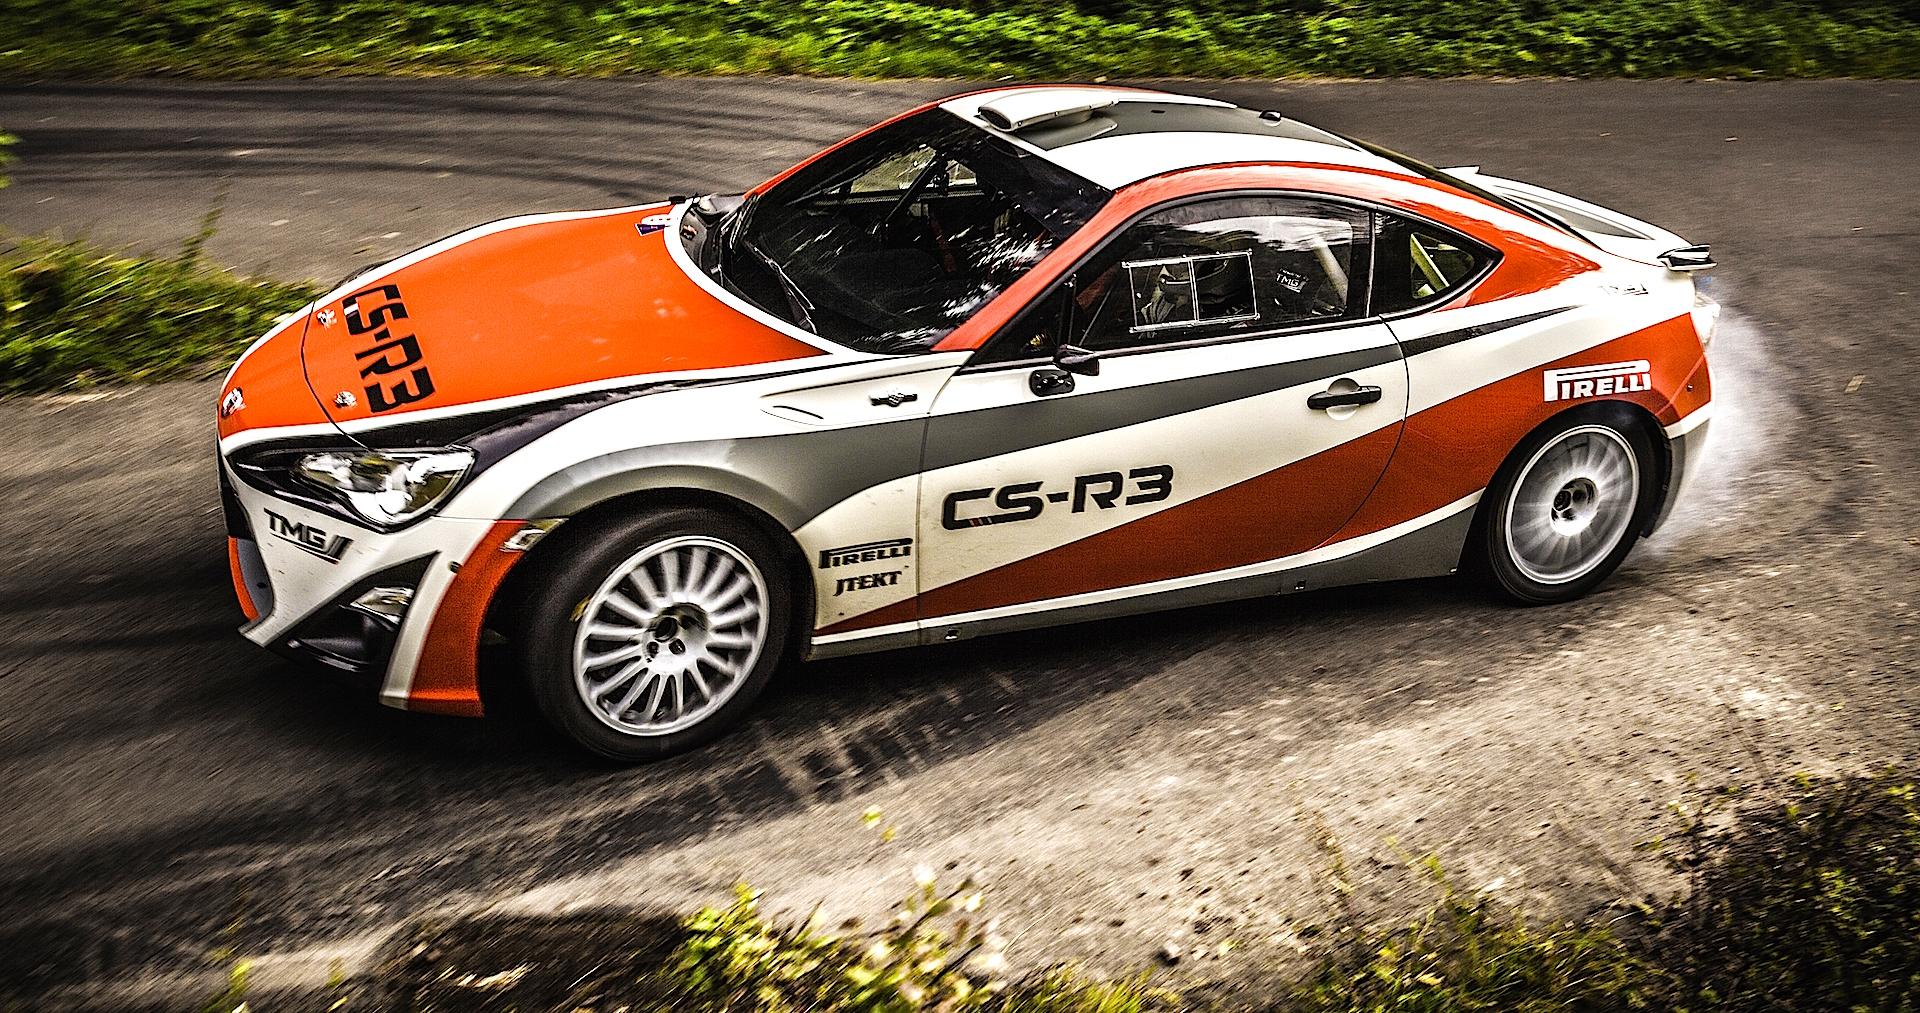 Toyota Motorsport fers Ultimate Car Kit – Build Your Own GT86 CS